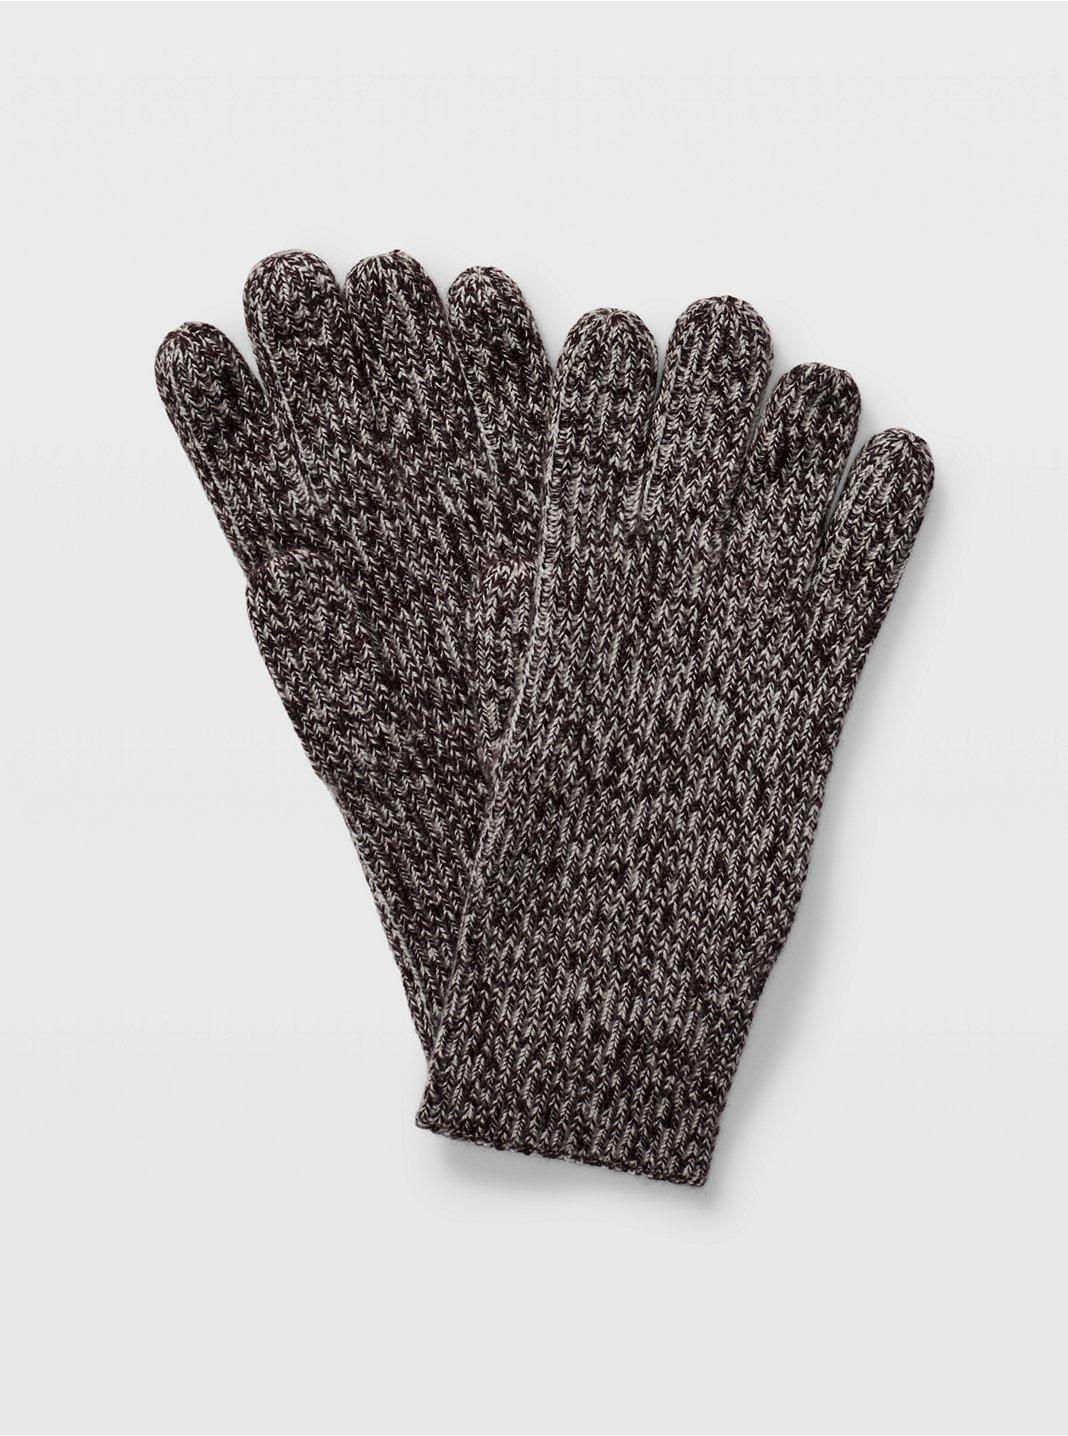 Kensington Cashmere Glove